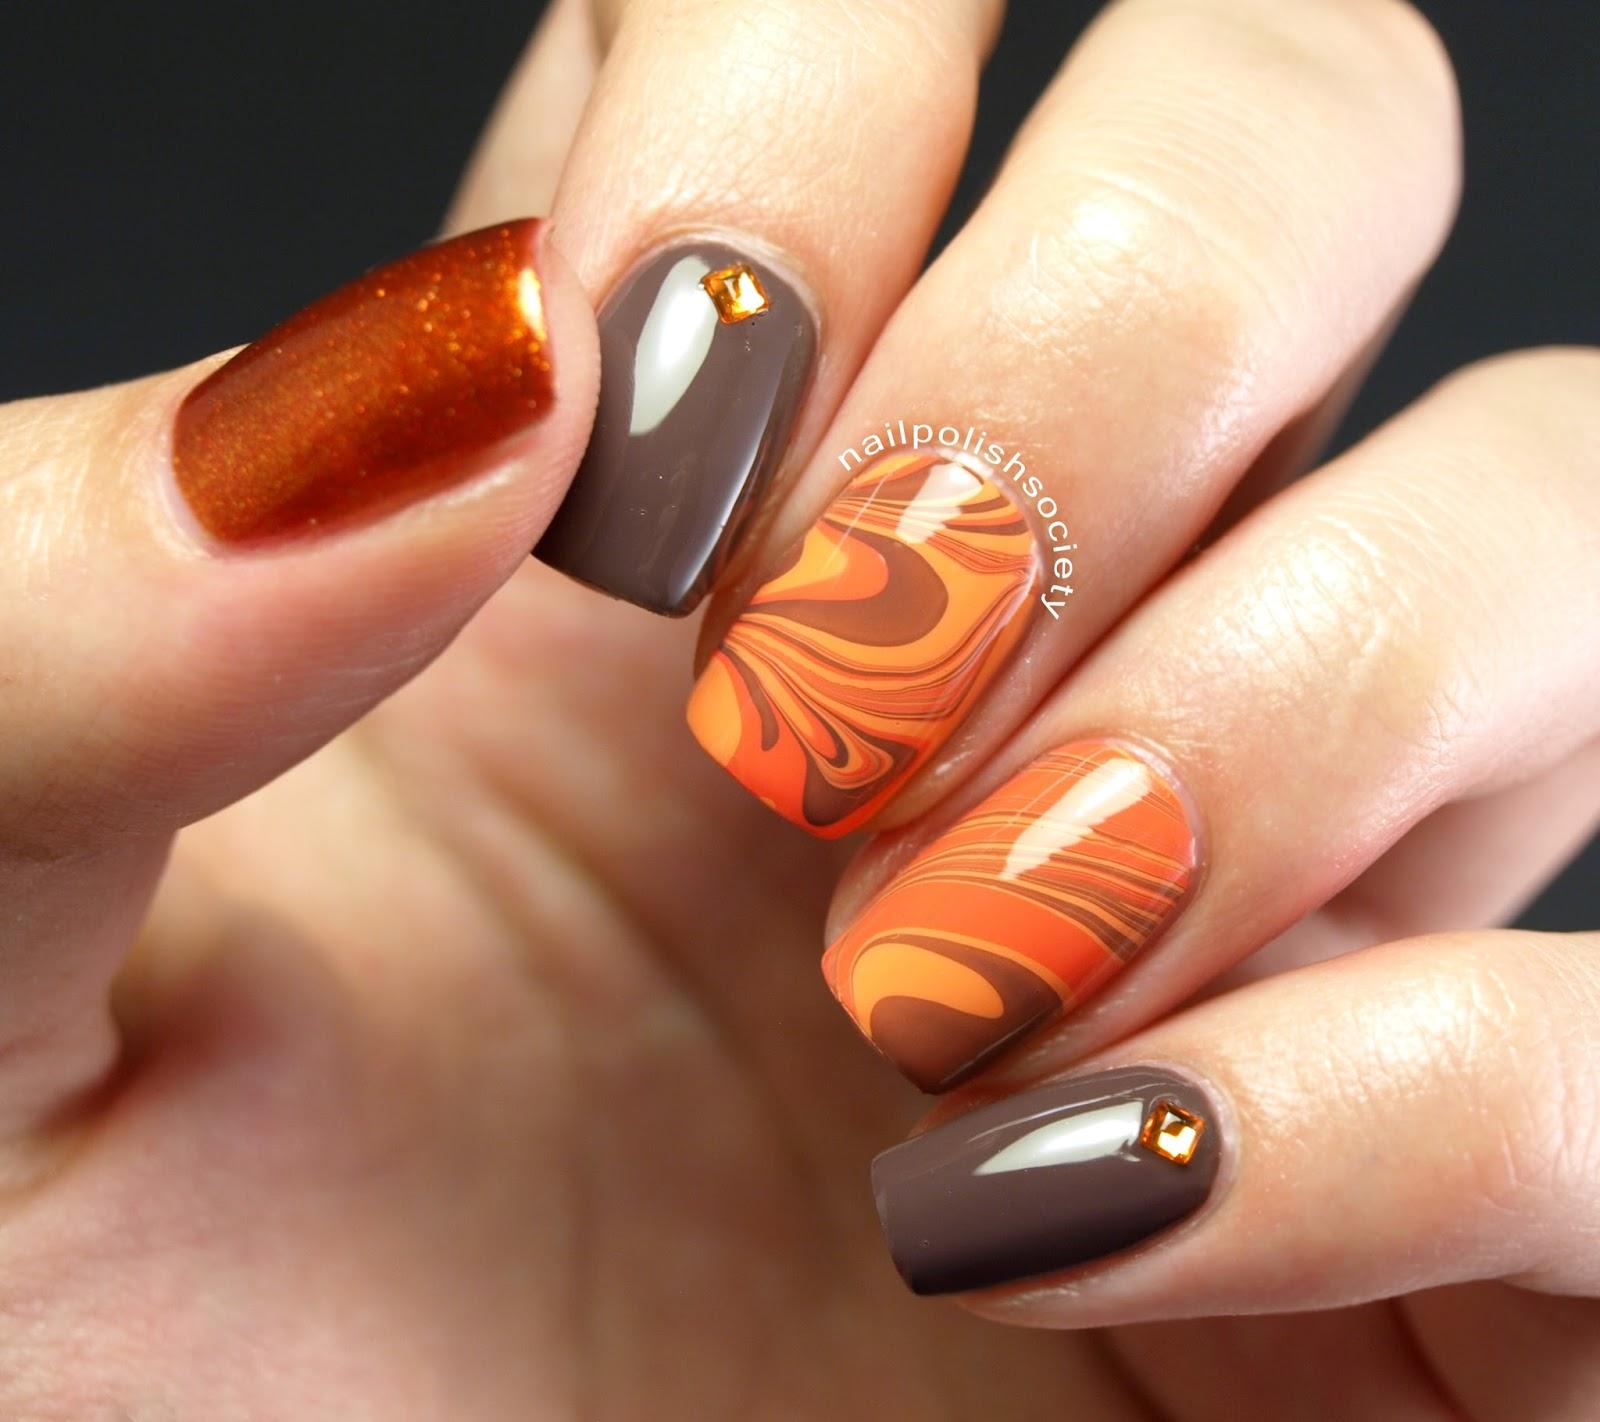 Last Autumn Nail Art Of The Year: Nail Polish Society: 31DC2014 Day 02: Orange Autumn Water